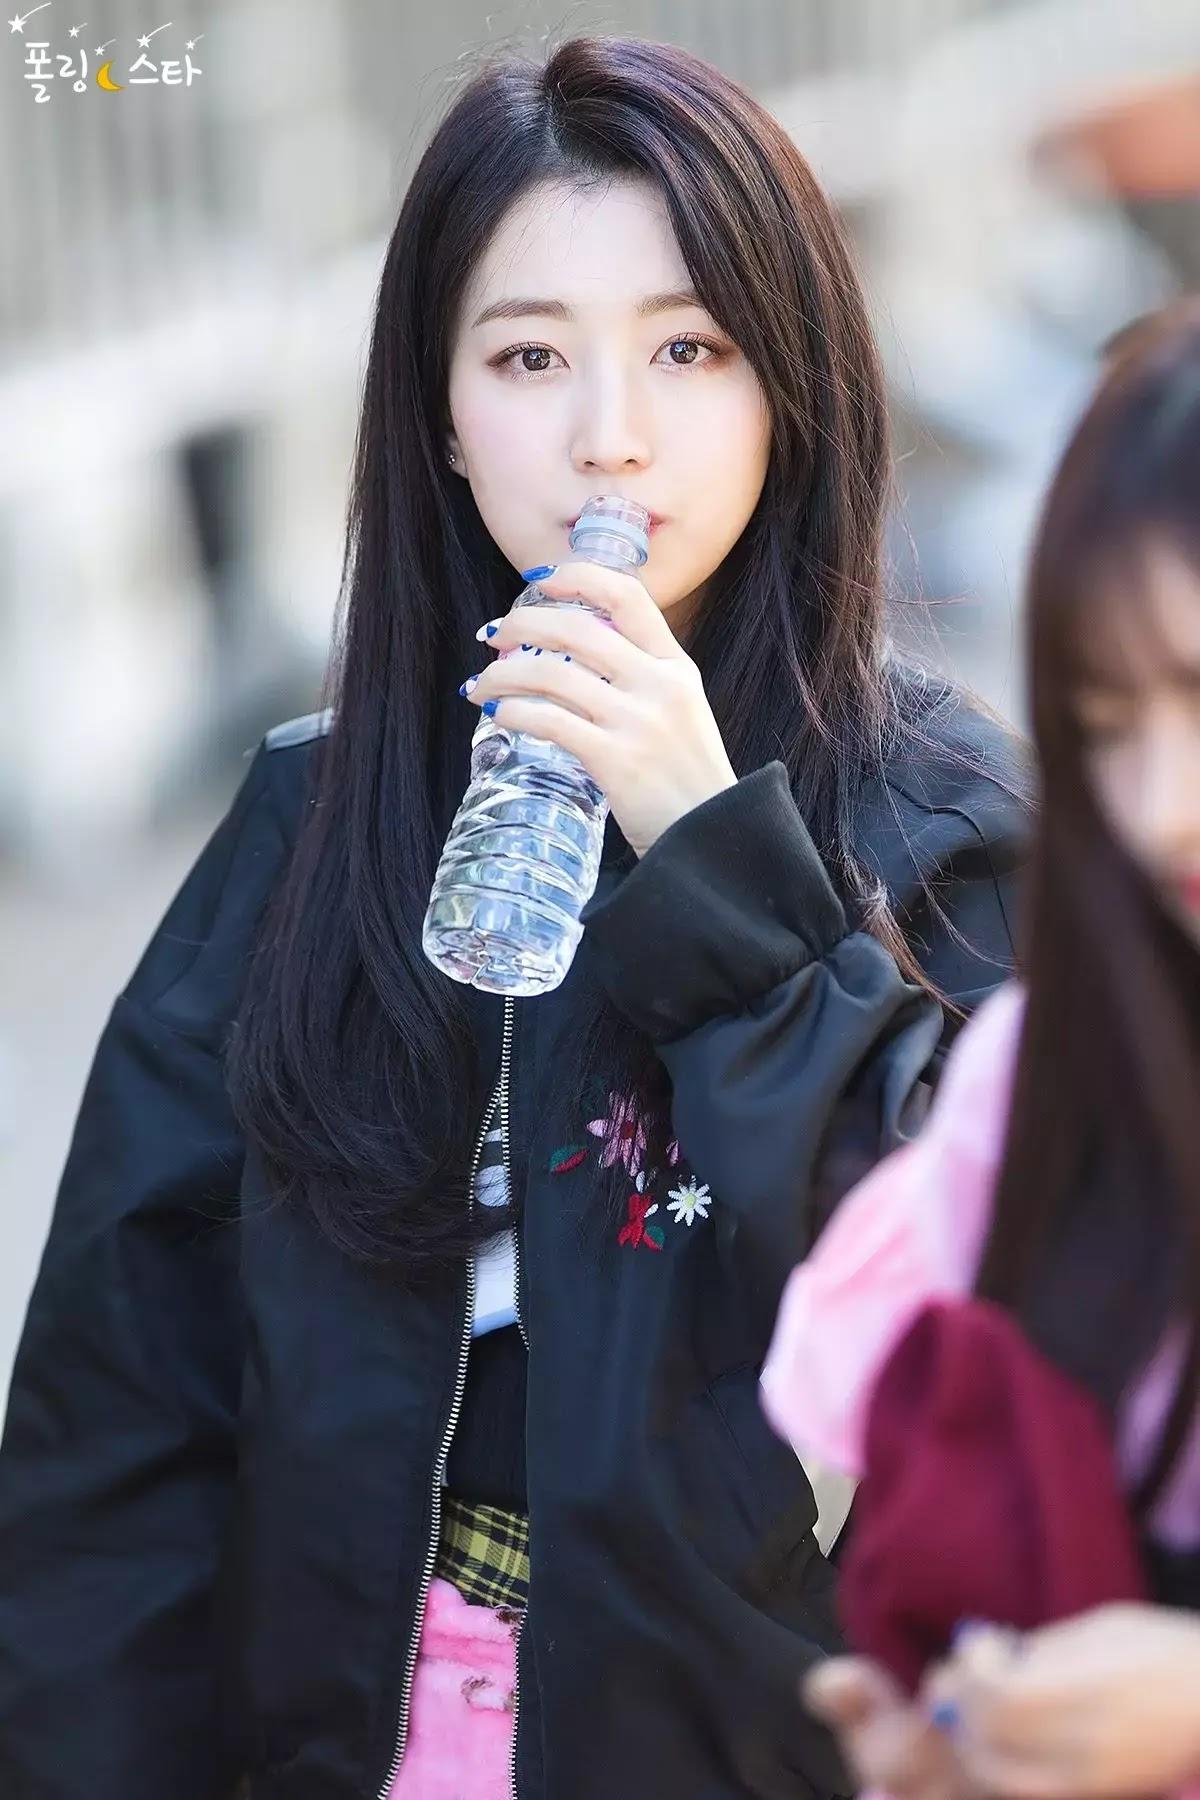 170310 gugudan - KBS 'Music Bank' Commute - 157p